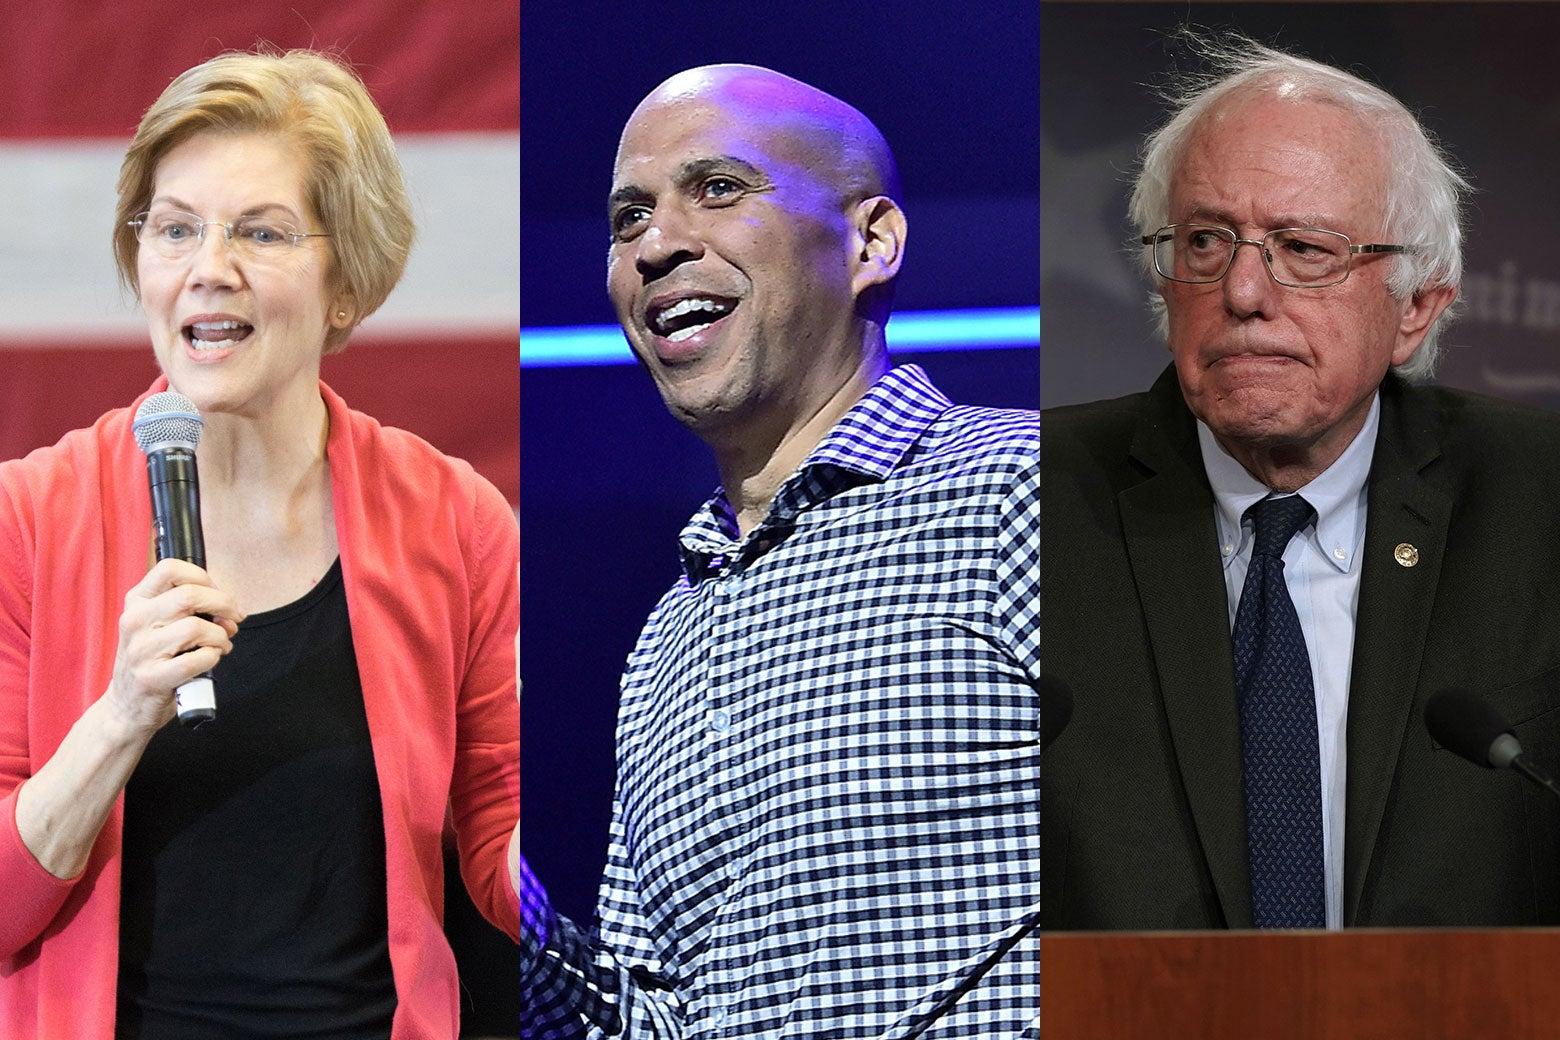 Elizabeth Warren, Cory Booker, and Bernie Sanders.